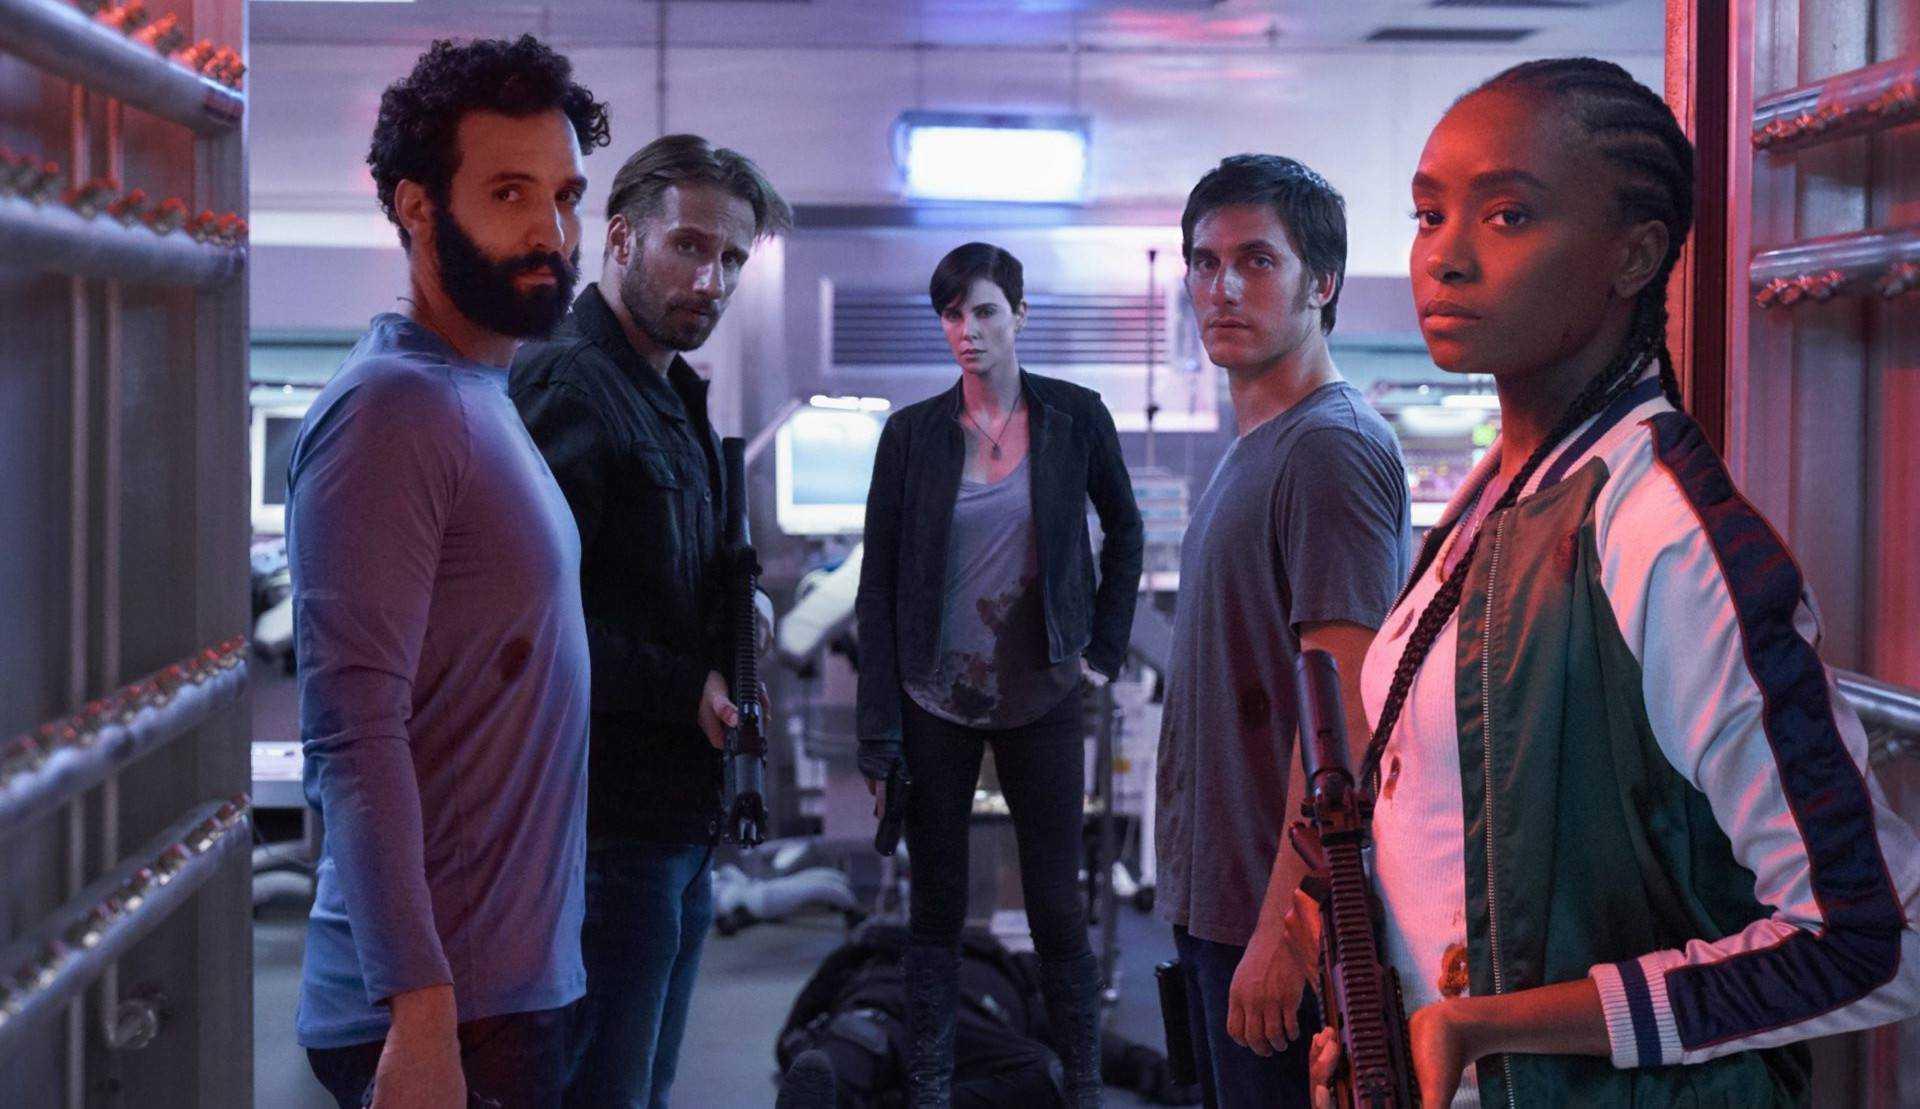 Charlize Theron confirma que roteiro de 'The Old Guard 2' já foi finalizado